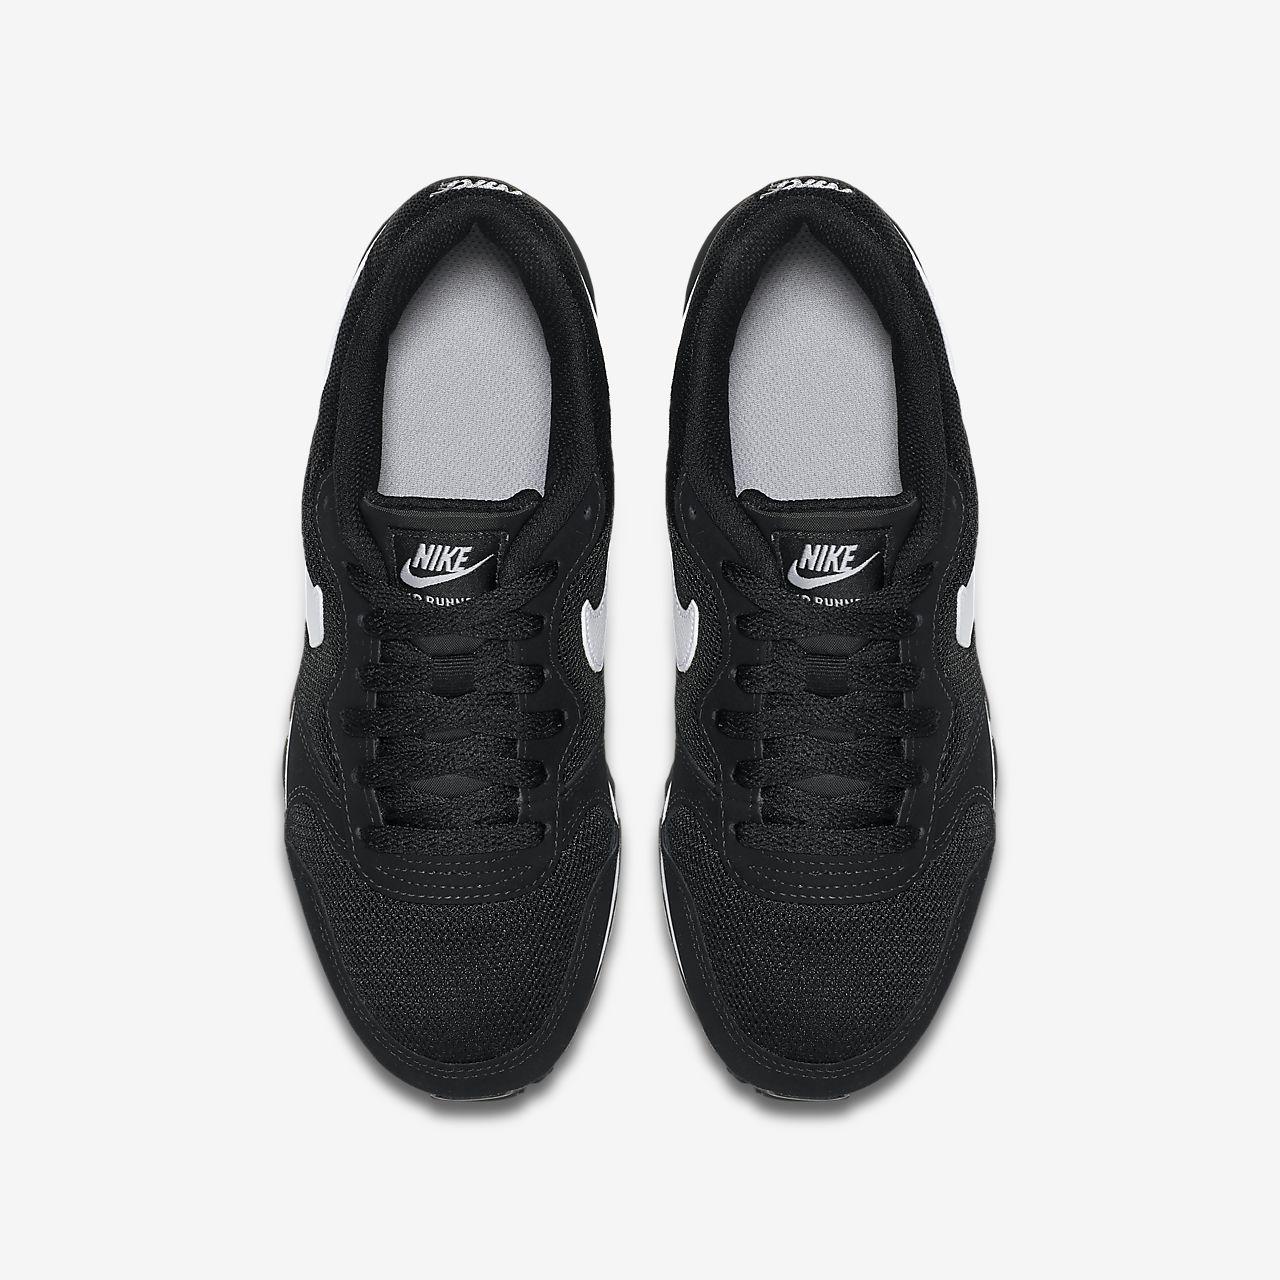 newest 630aa 12d3f ... Nike MD Runner 2 Schuh für ältere Kinder